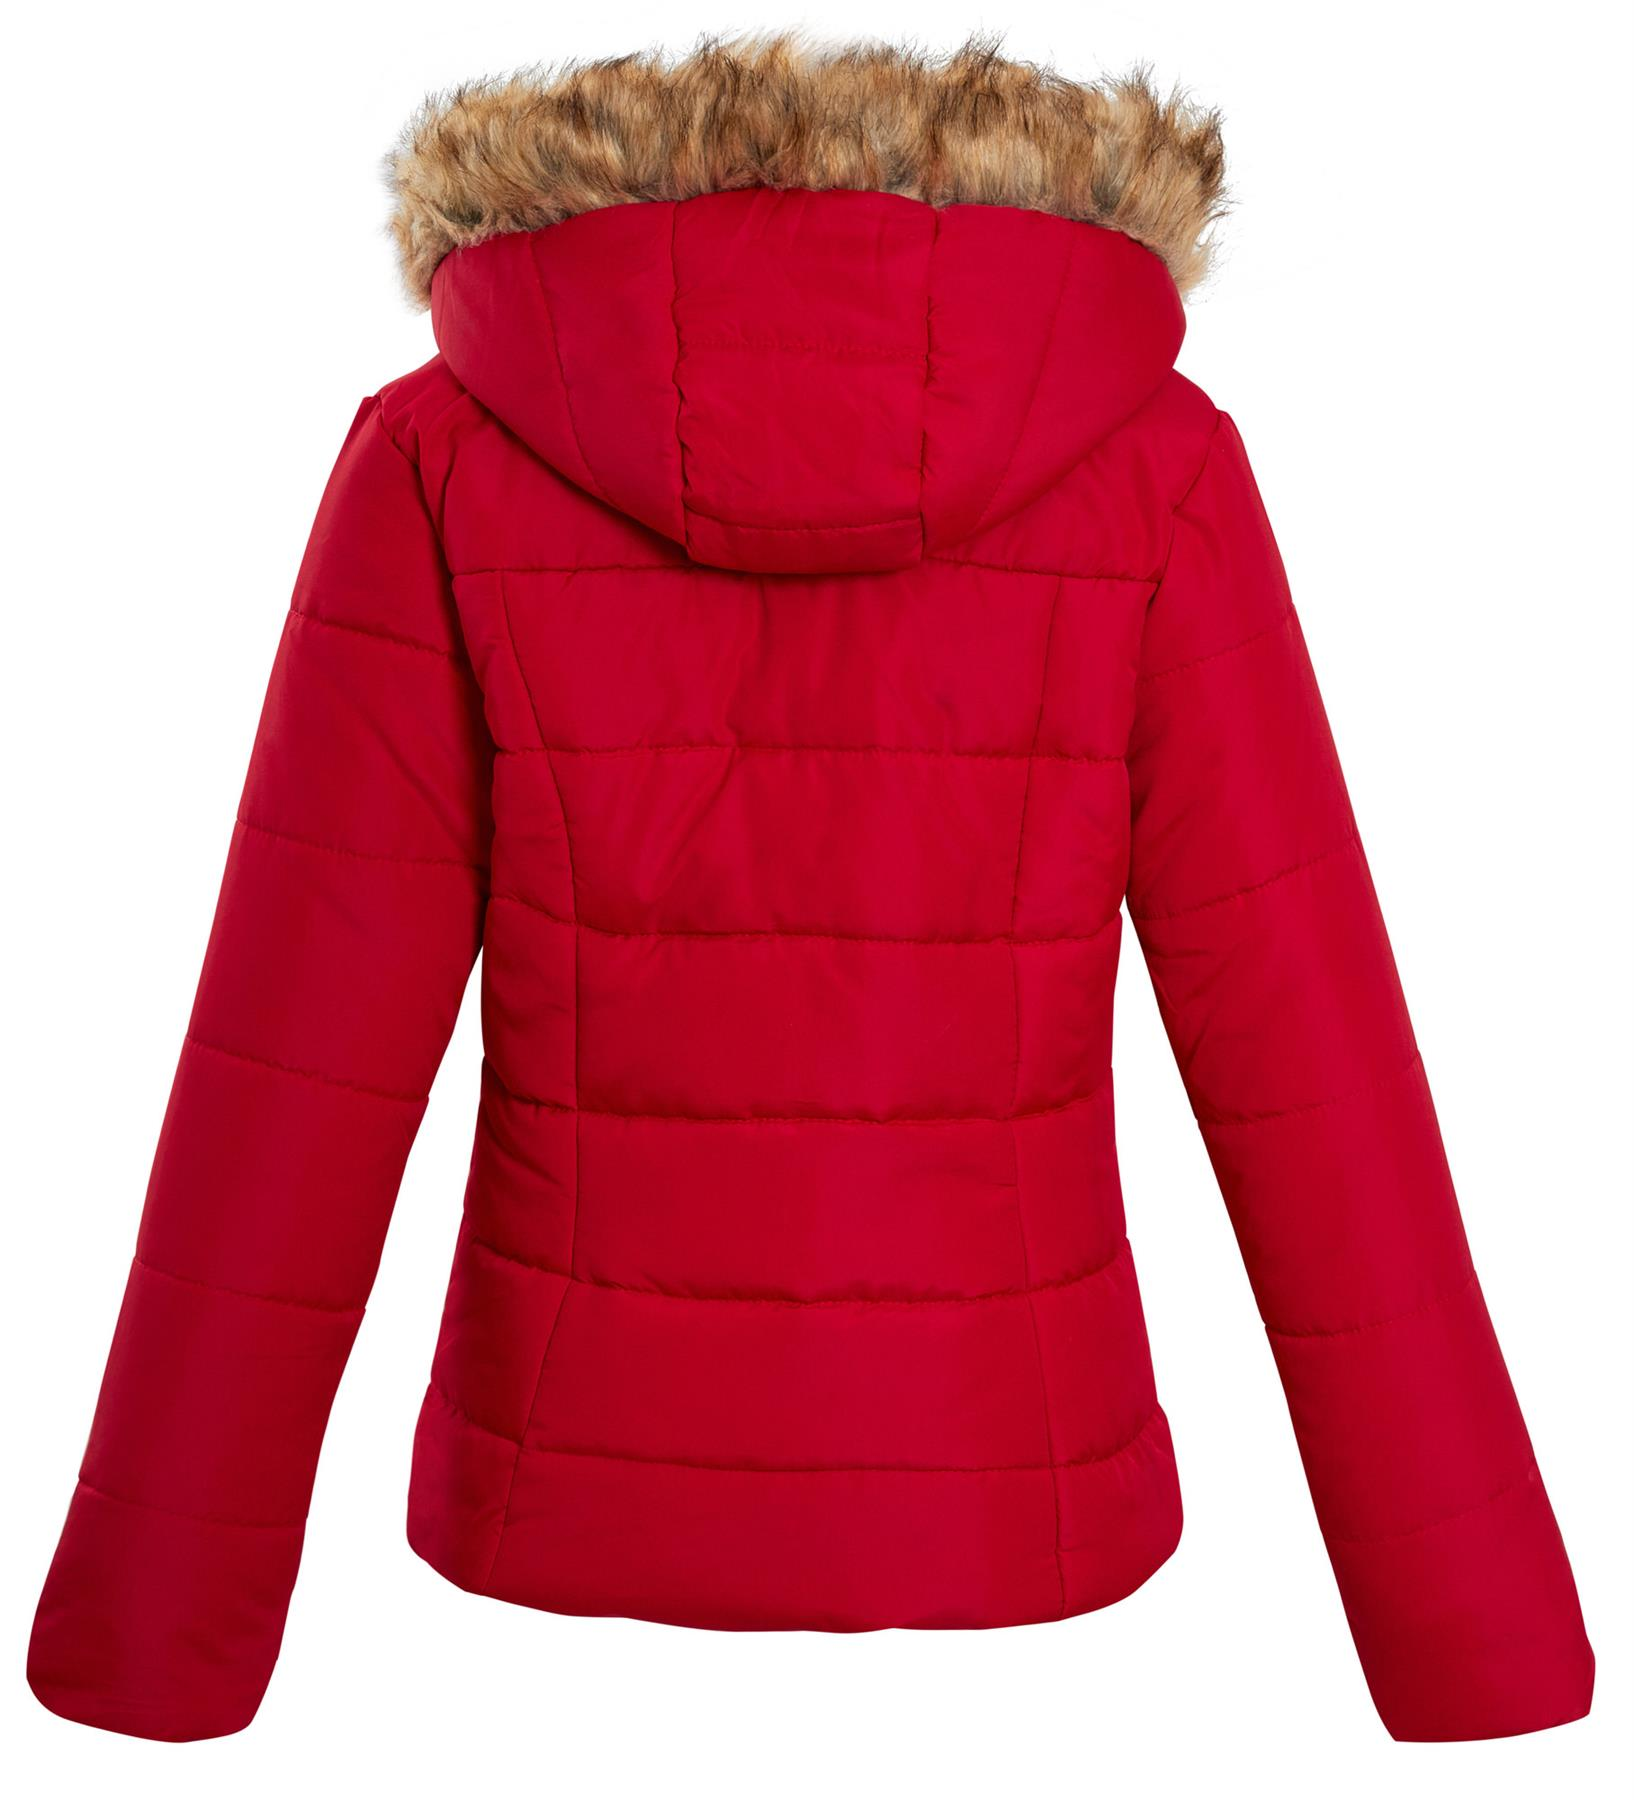 Shelikes-Ladies-Padded-Faux-Fur-Trim-Hood-Hooded-Jacket-Winter-Coat-Size-6-to-16 miniatuur 13